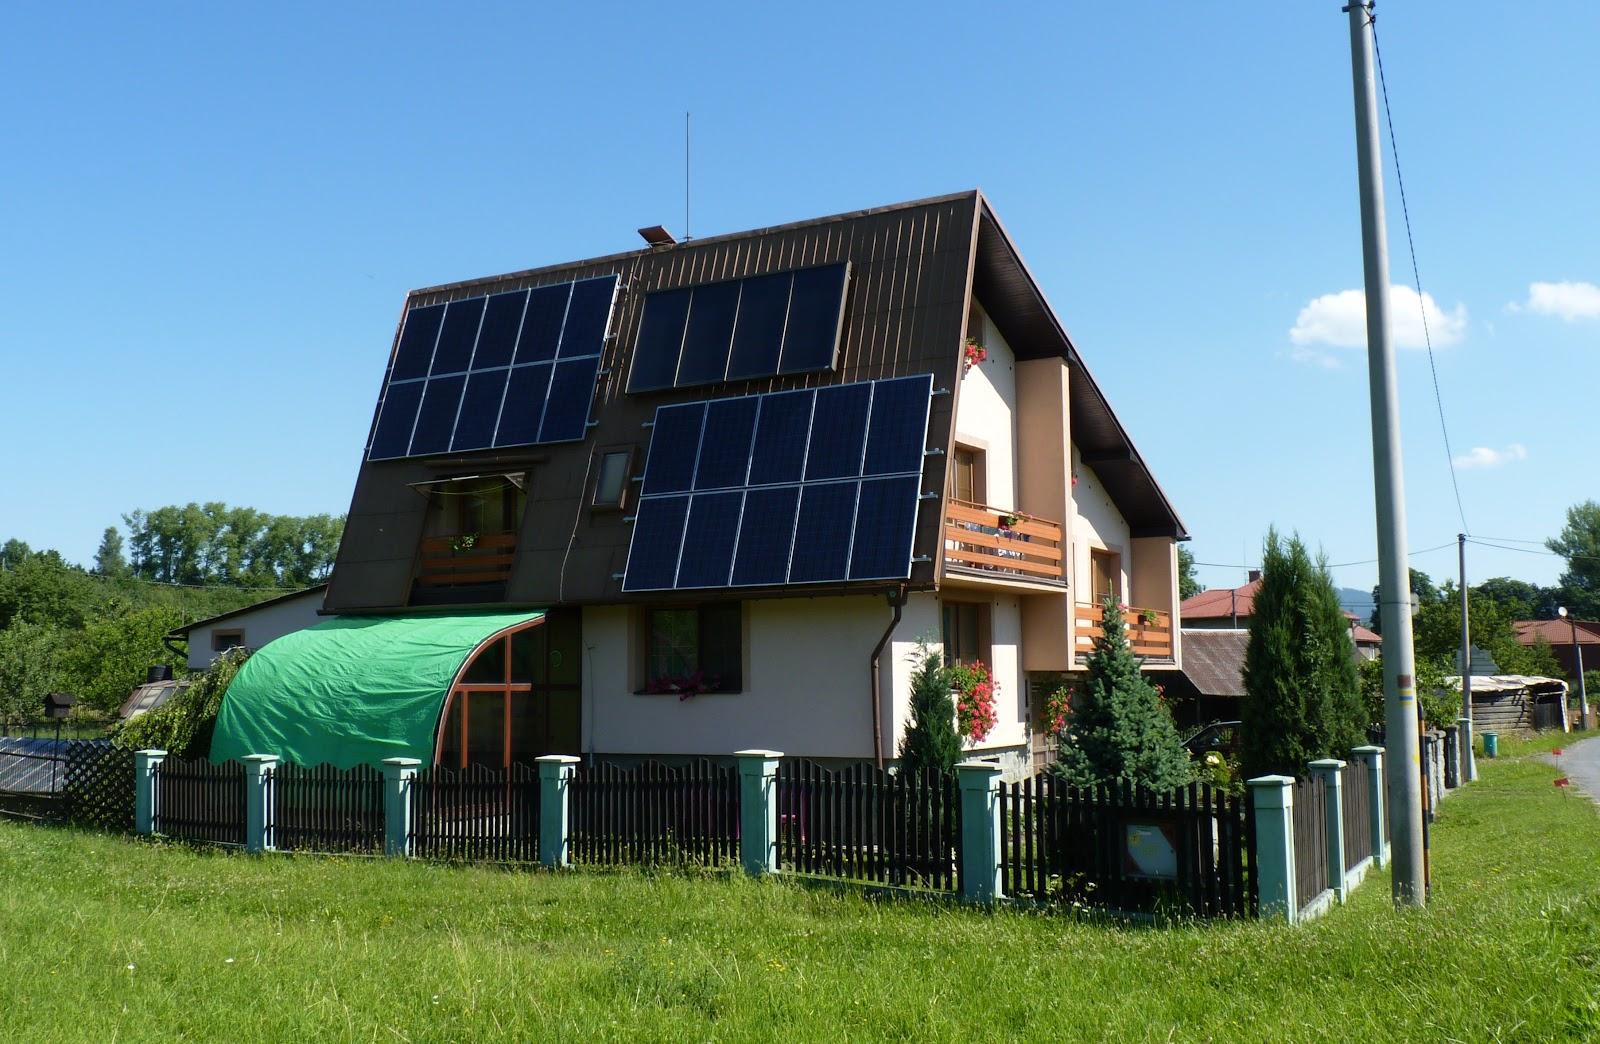 Jablunkov,_dům_se_solárními_panely.JPG